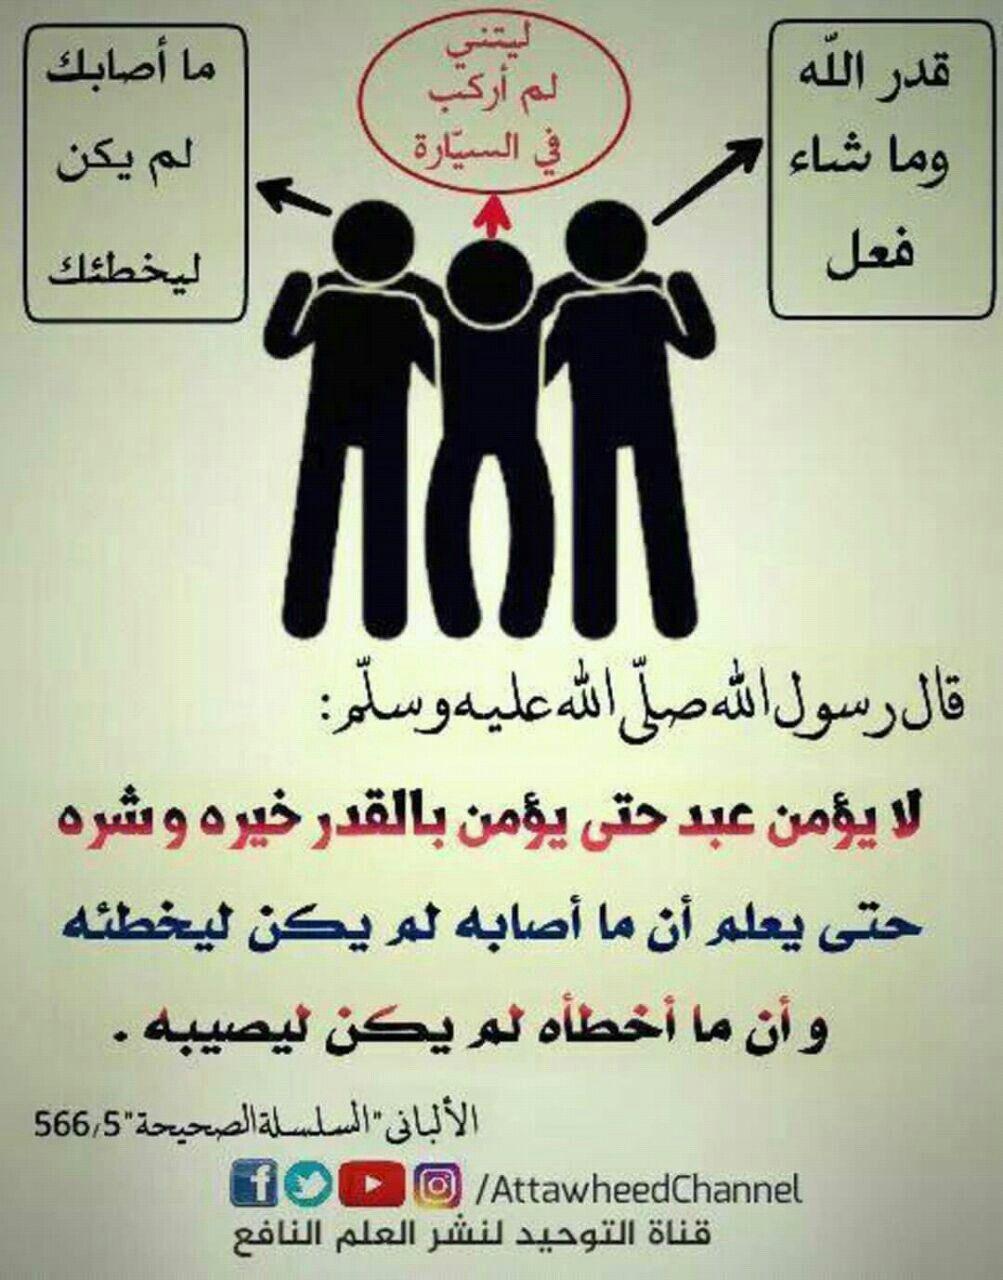 Pin By Nor Elhoda On احاديث صحيحه Life Quotes Quotes Islam